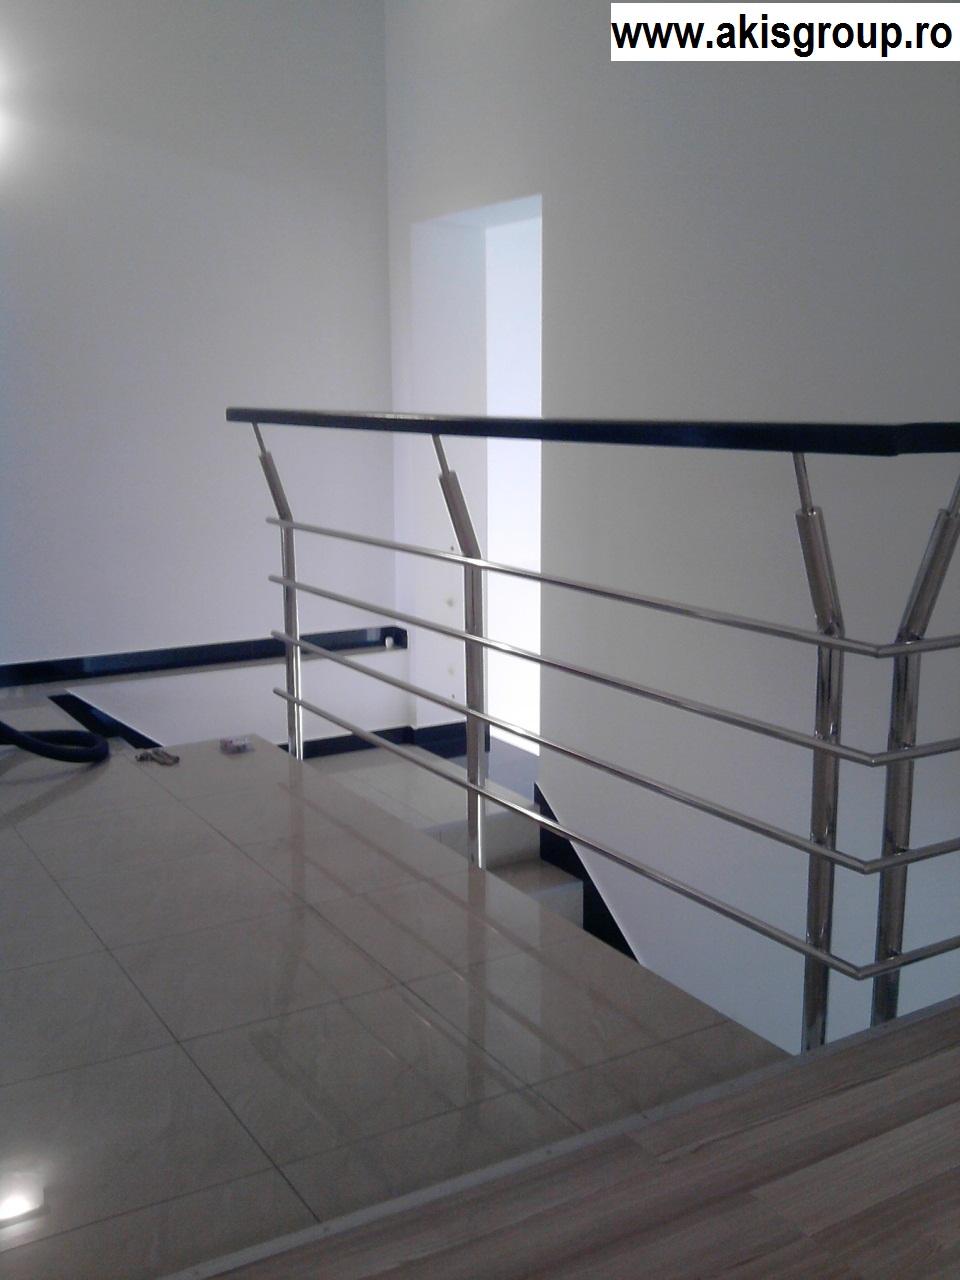 balustrade cu sticla balustrade inox de interior. Black Bedroom Furniture Sets. Home Design Ideas